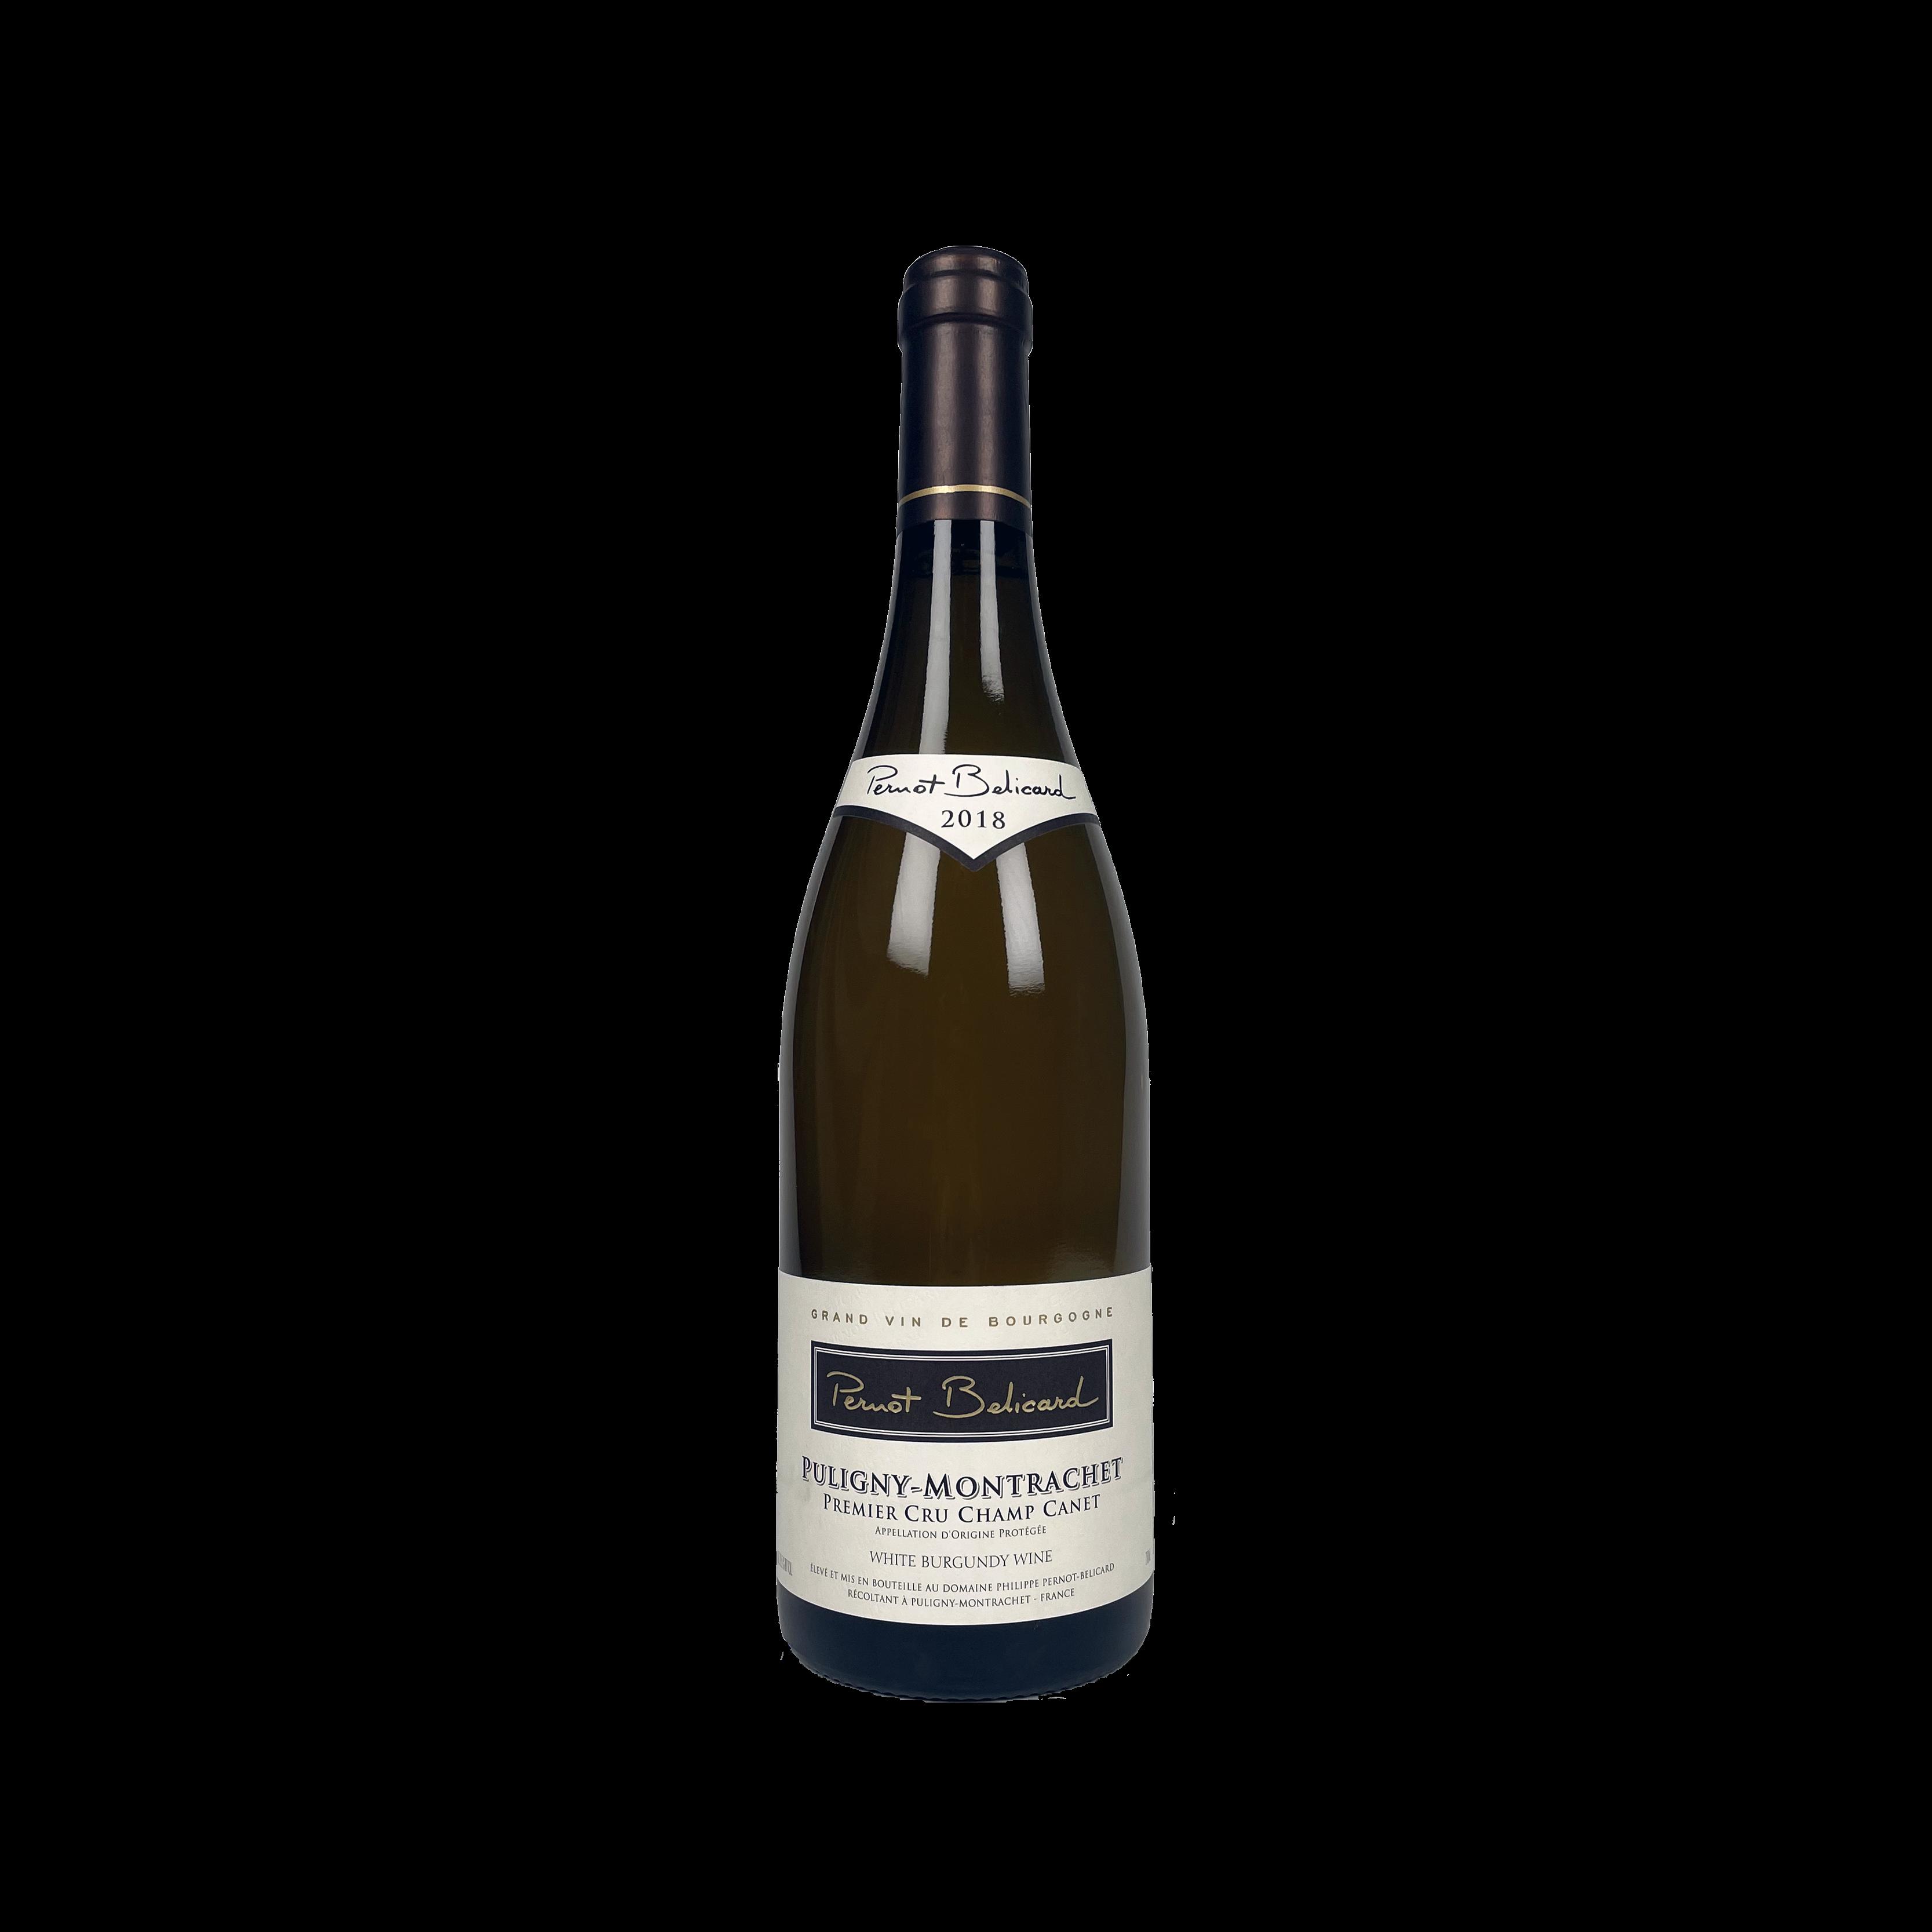 Pernot Belicard Puligny Montrachet 1er Cru Champs Canet, 2018, 75CL